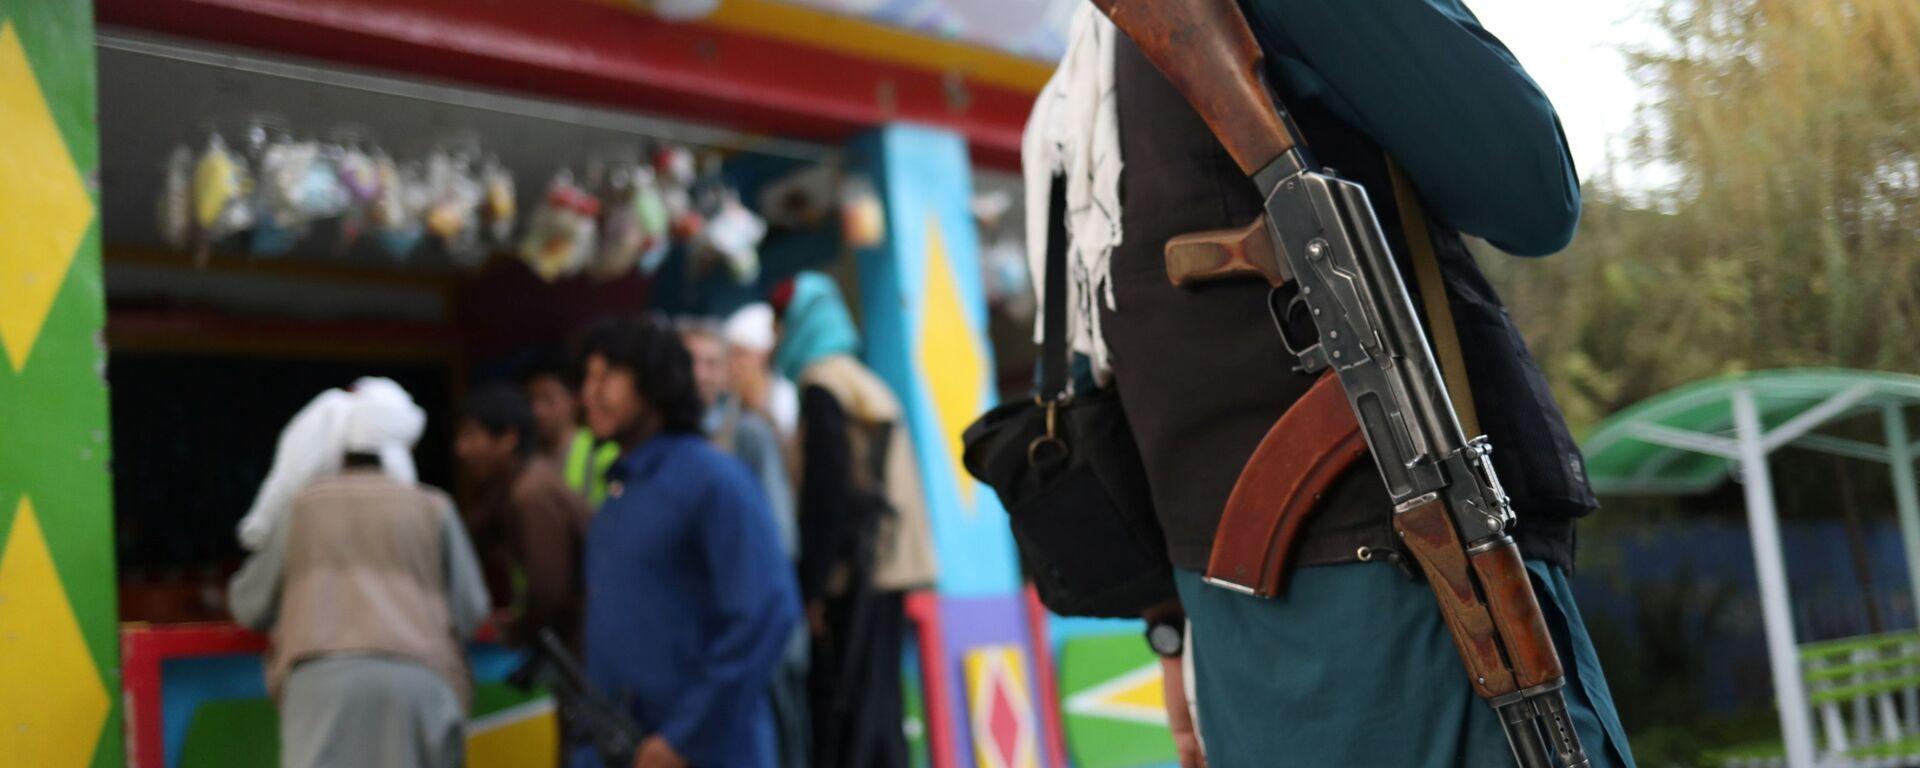 Боец Талибана* с винтовкой в парке развлечений в Кабуле - Sputnik Узбекистан, 1920, 15.09.2021